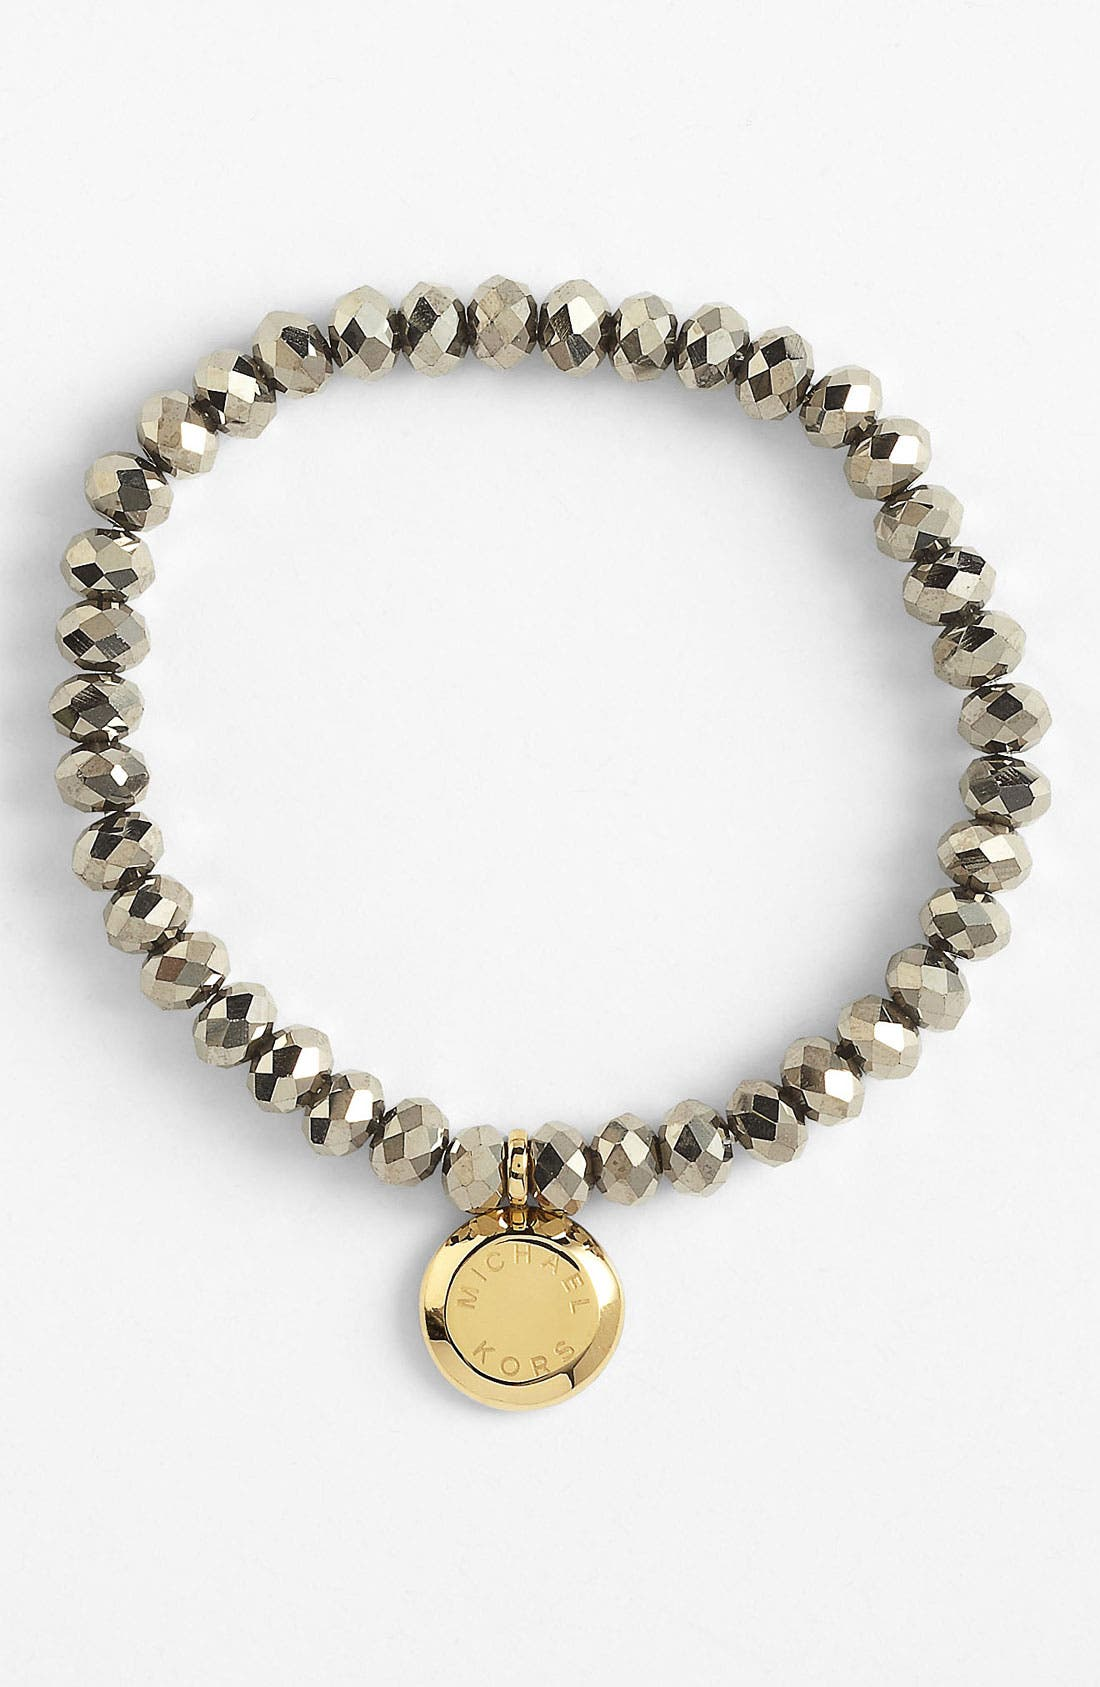 Alternate Image 1 Selected - Michael Kors 'Brilliance' Charm Bead Stretch Bracelet